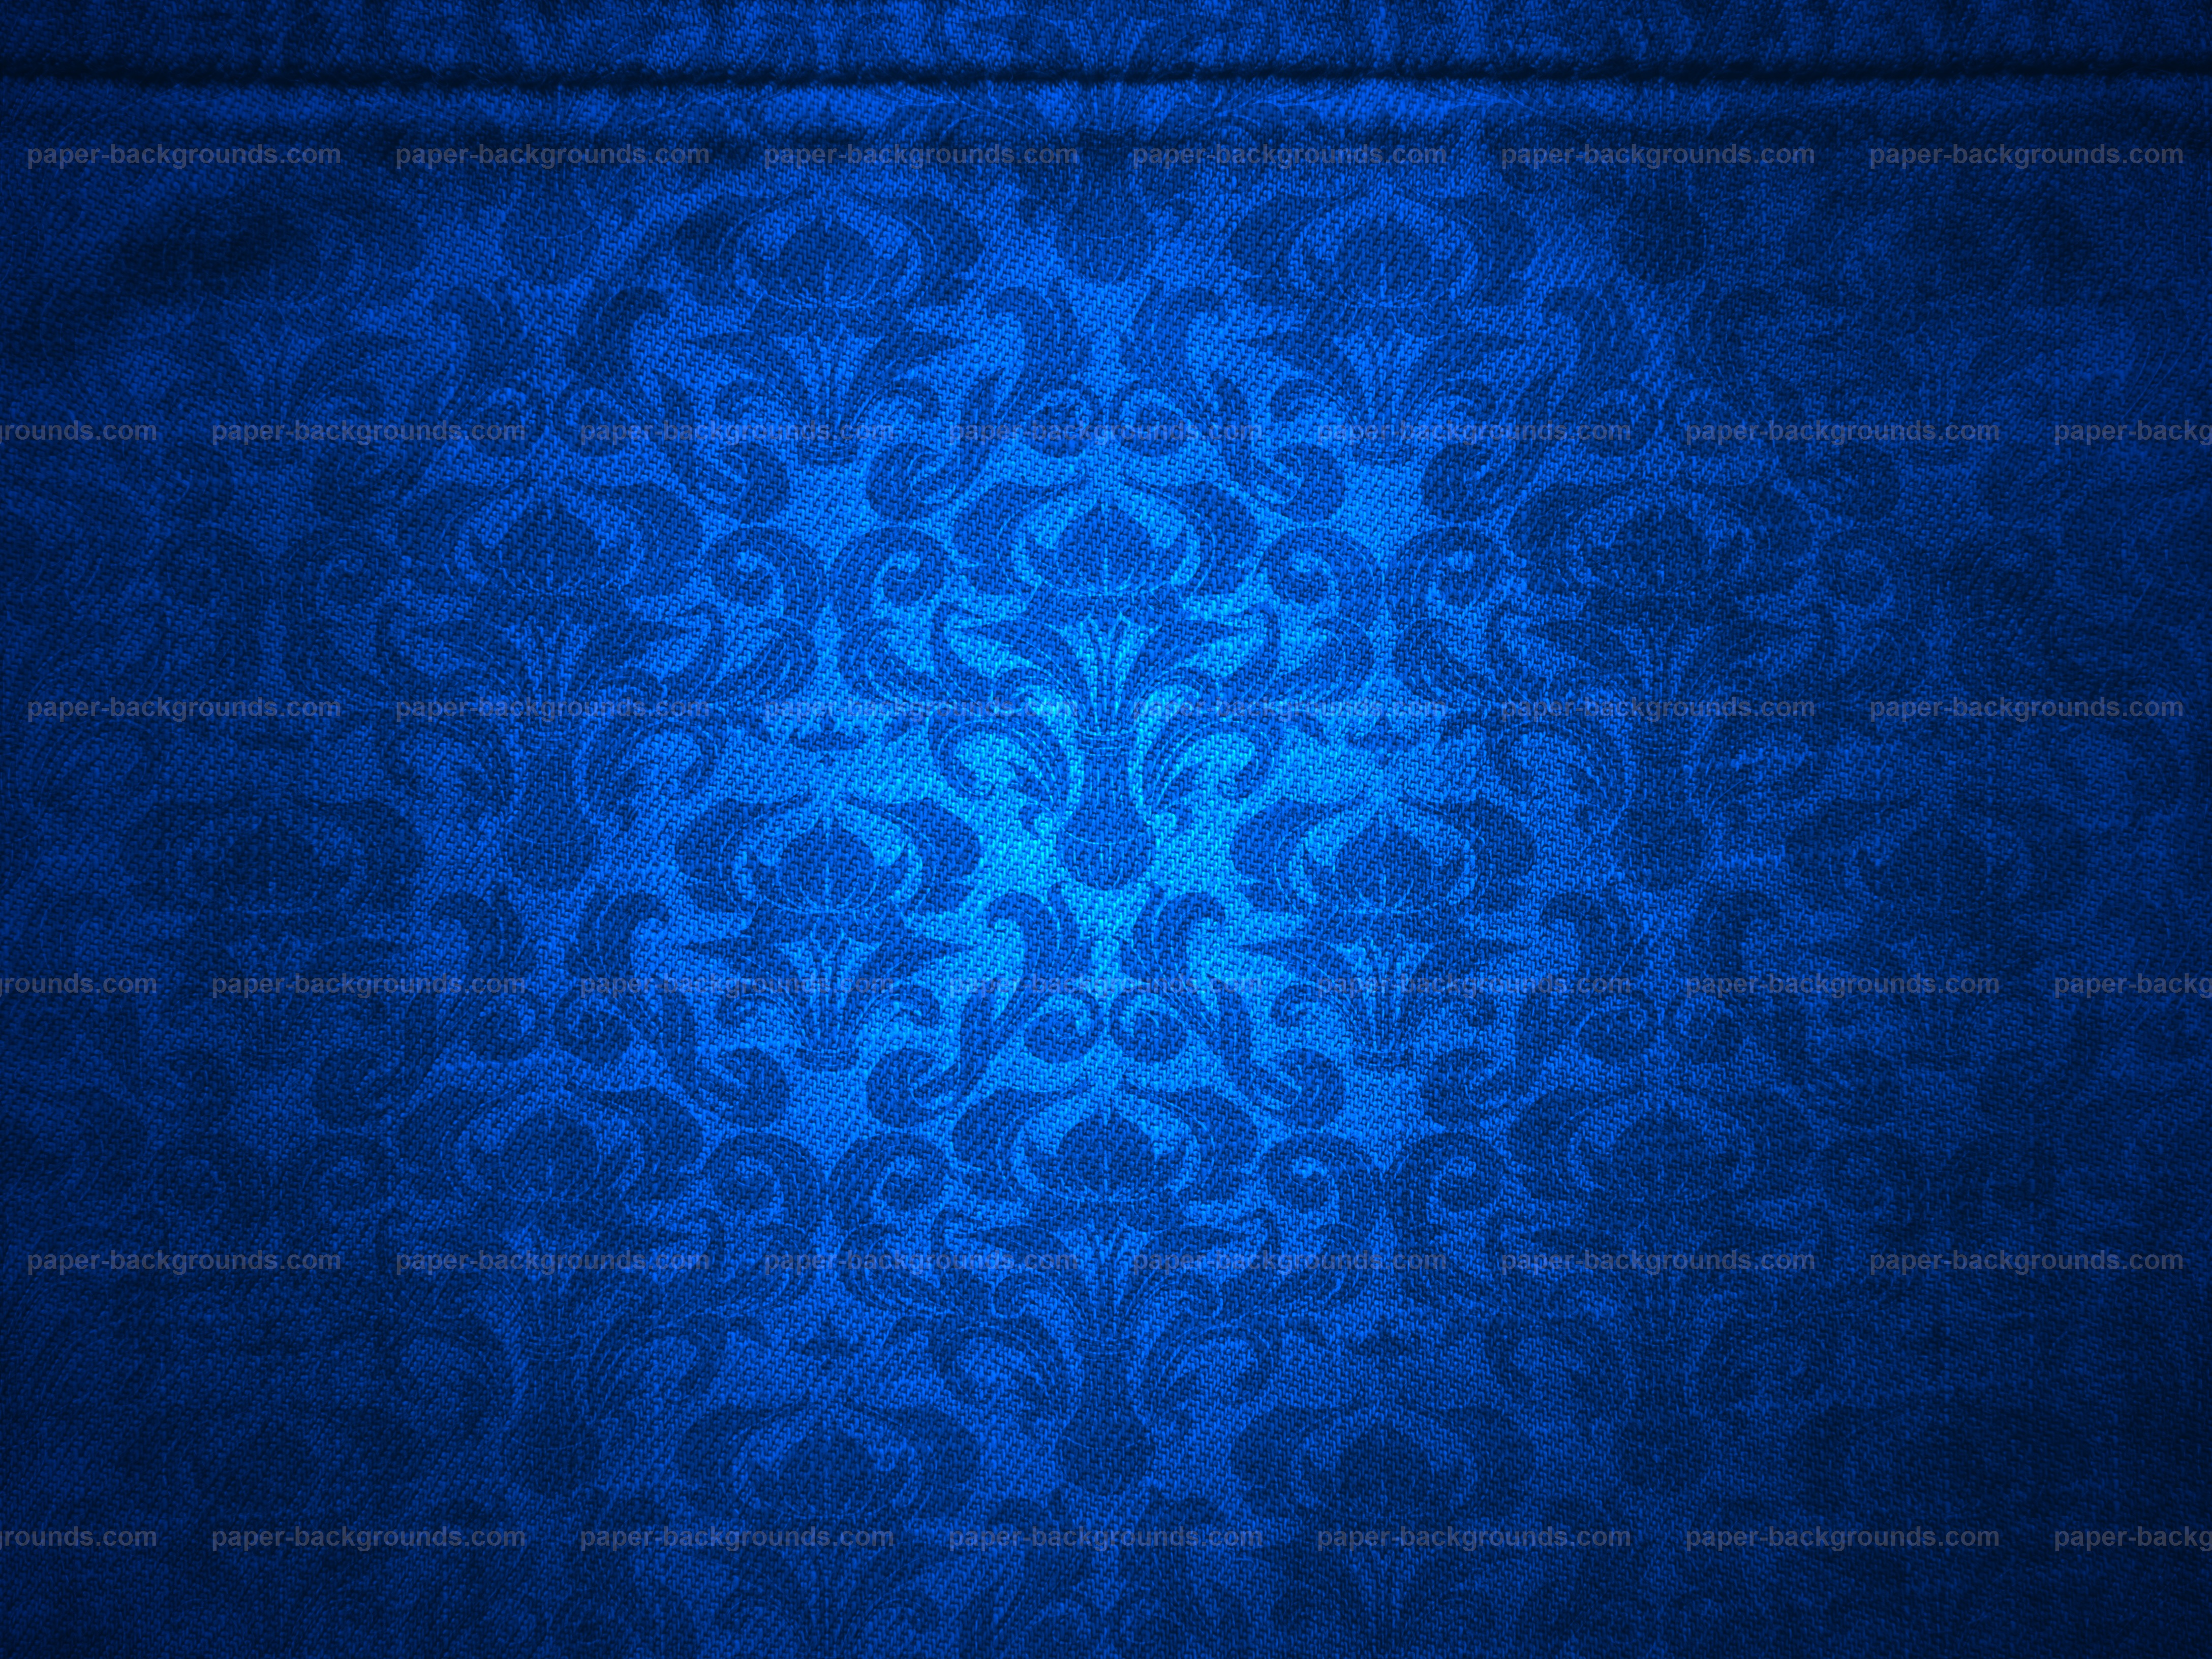 Dark Blue Damask Wallpaper: Royal Blue Background Wallpaper